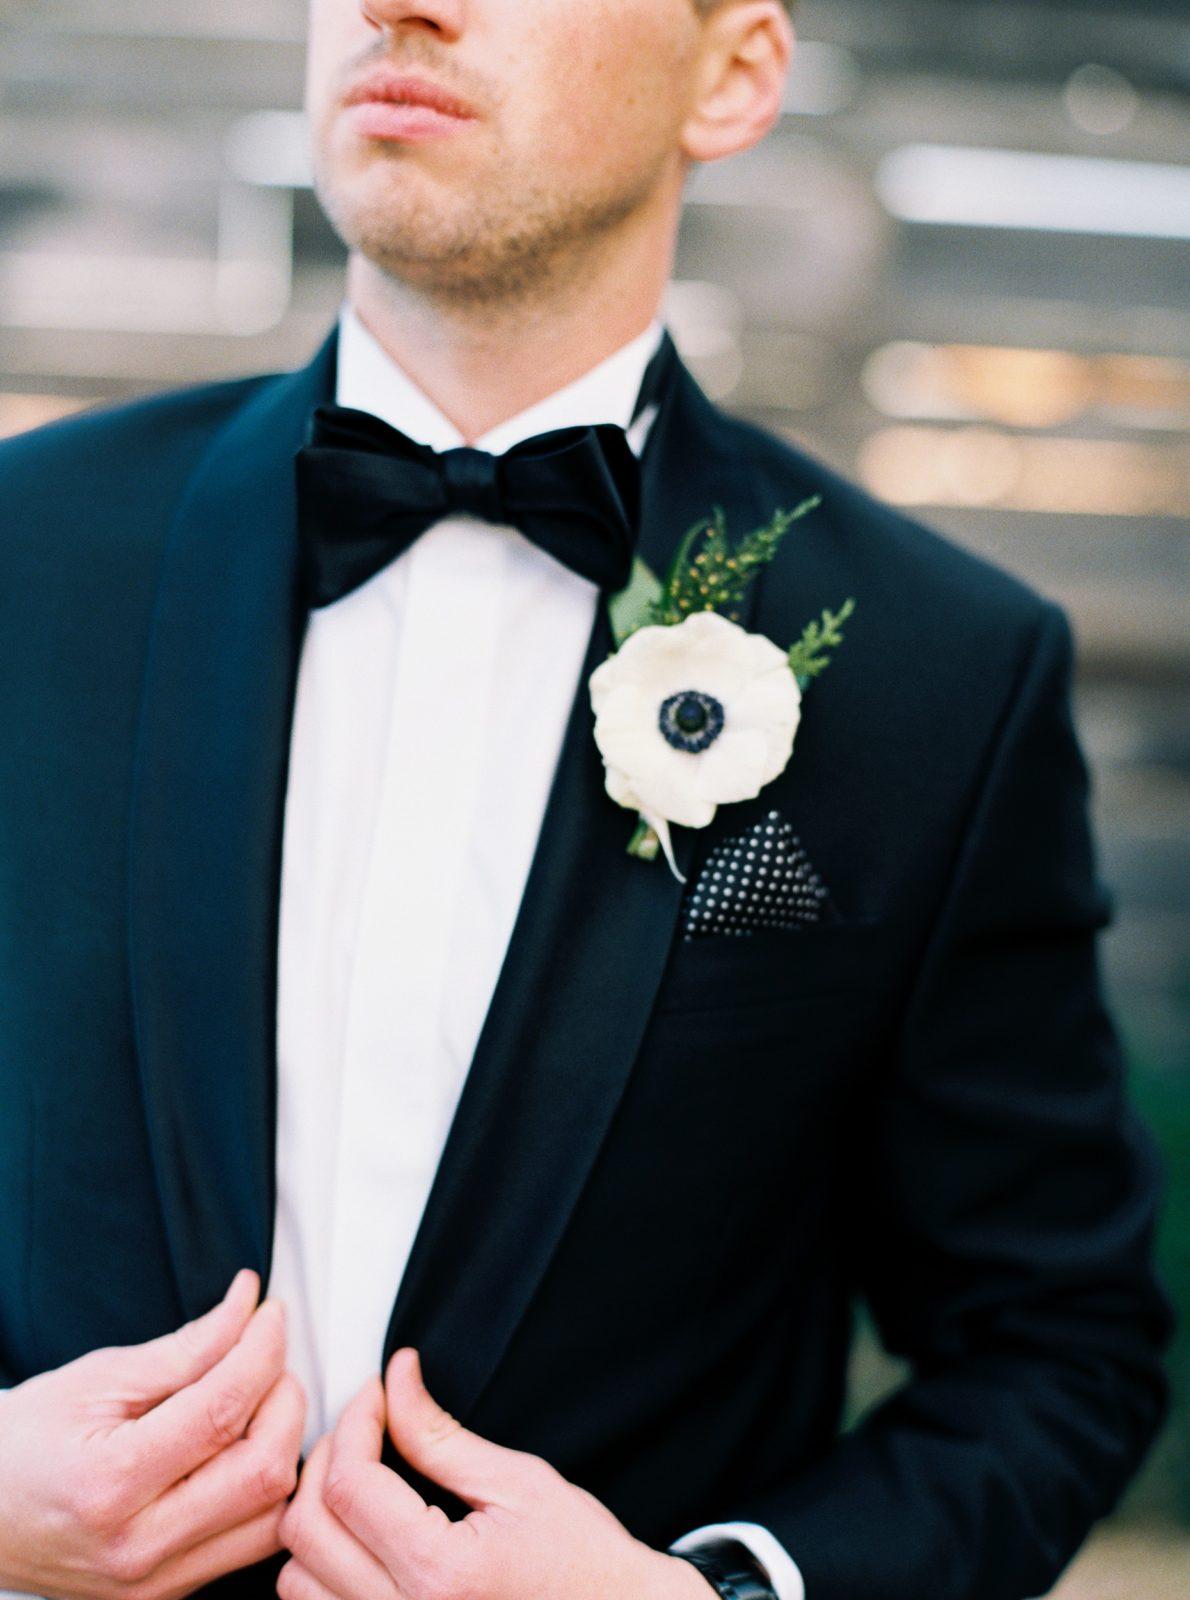 Monica Alberty DFW Wedding Photography featured on Alexa Kay Events